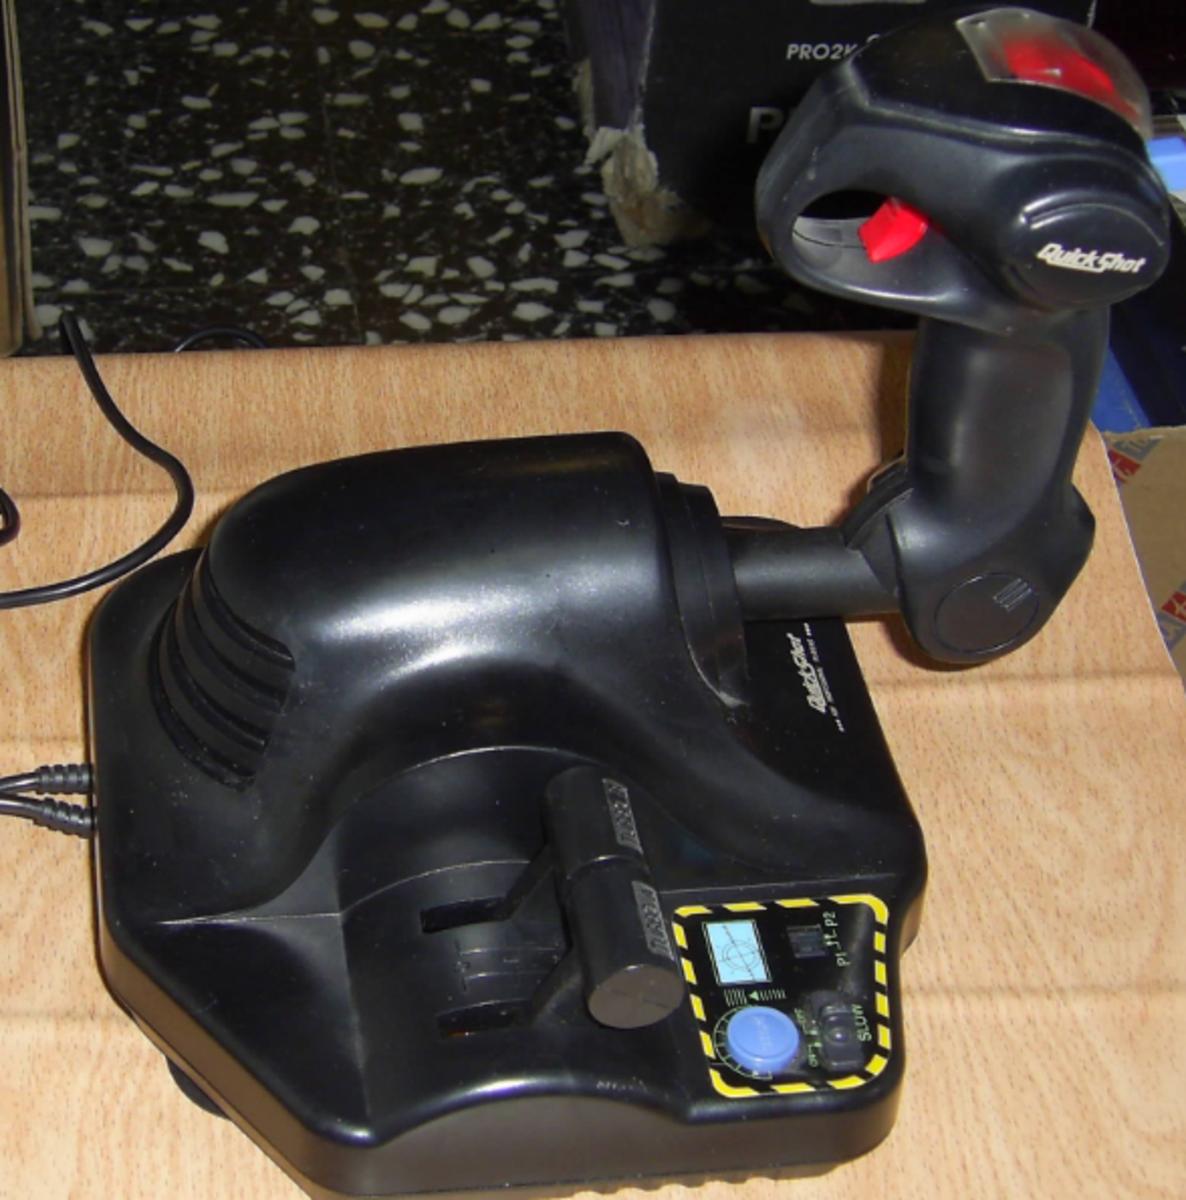 A quickshot joystick